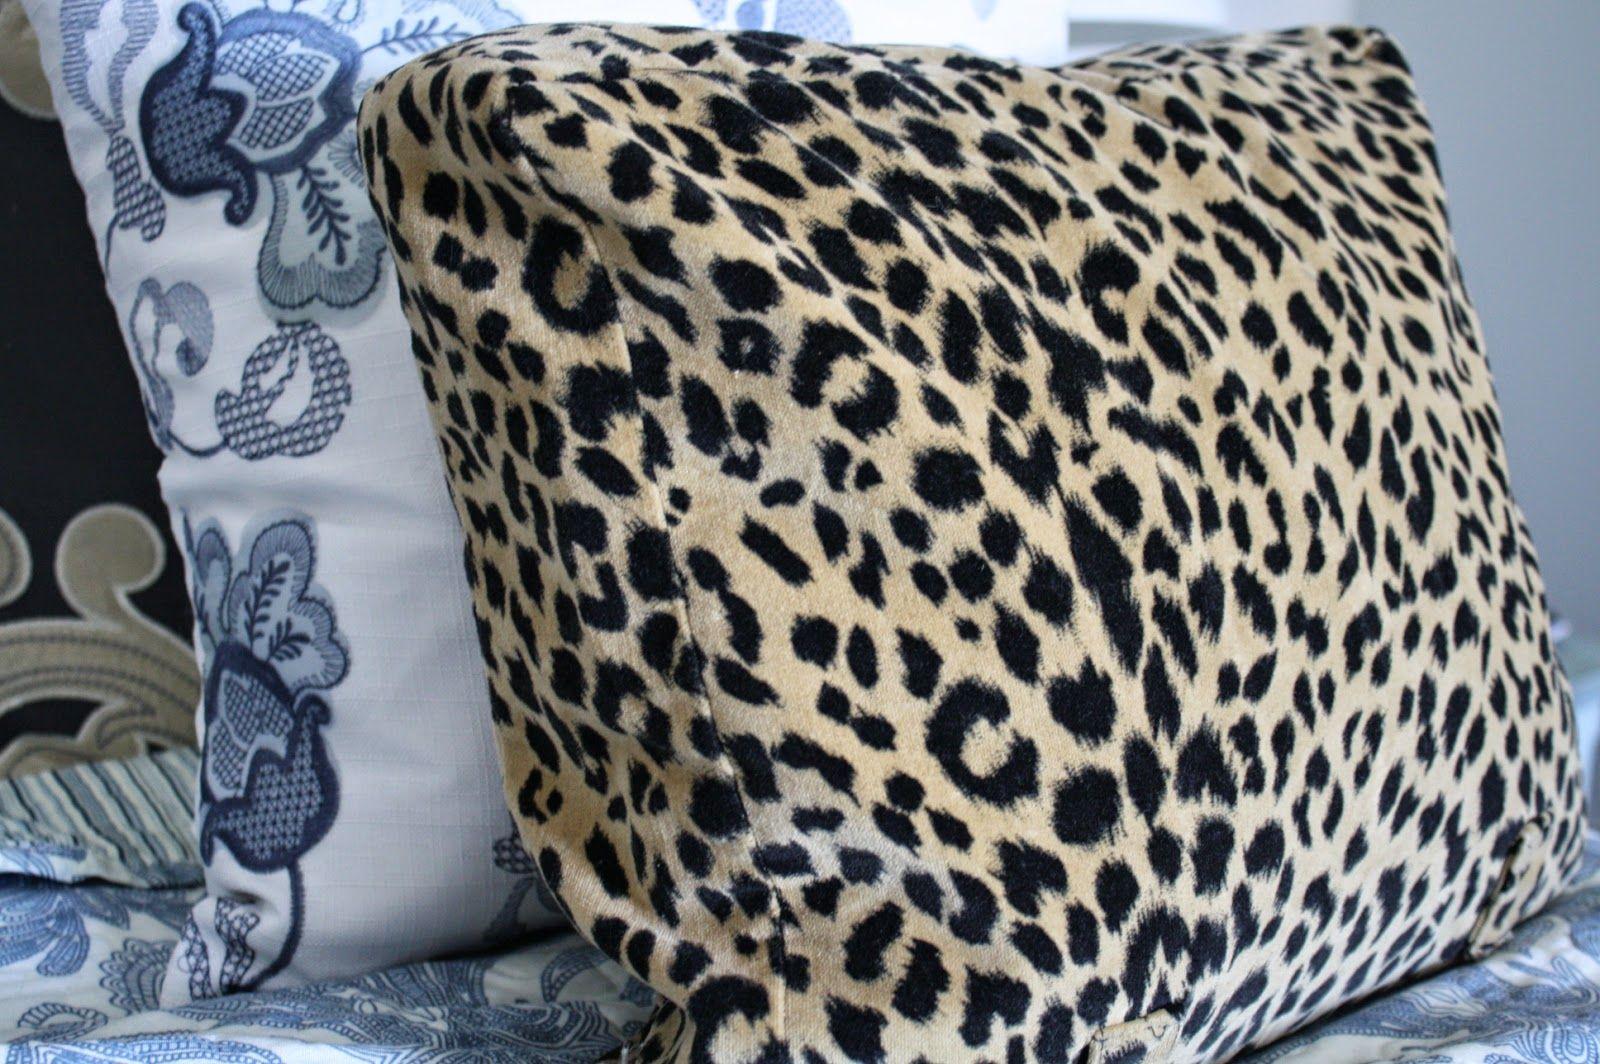 DIY School bag to pillow soiledrotten.blogspot.com